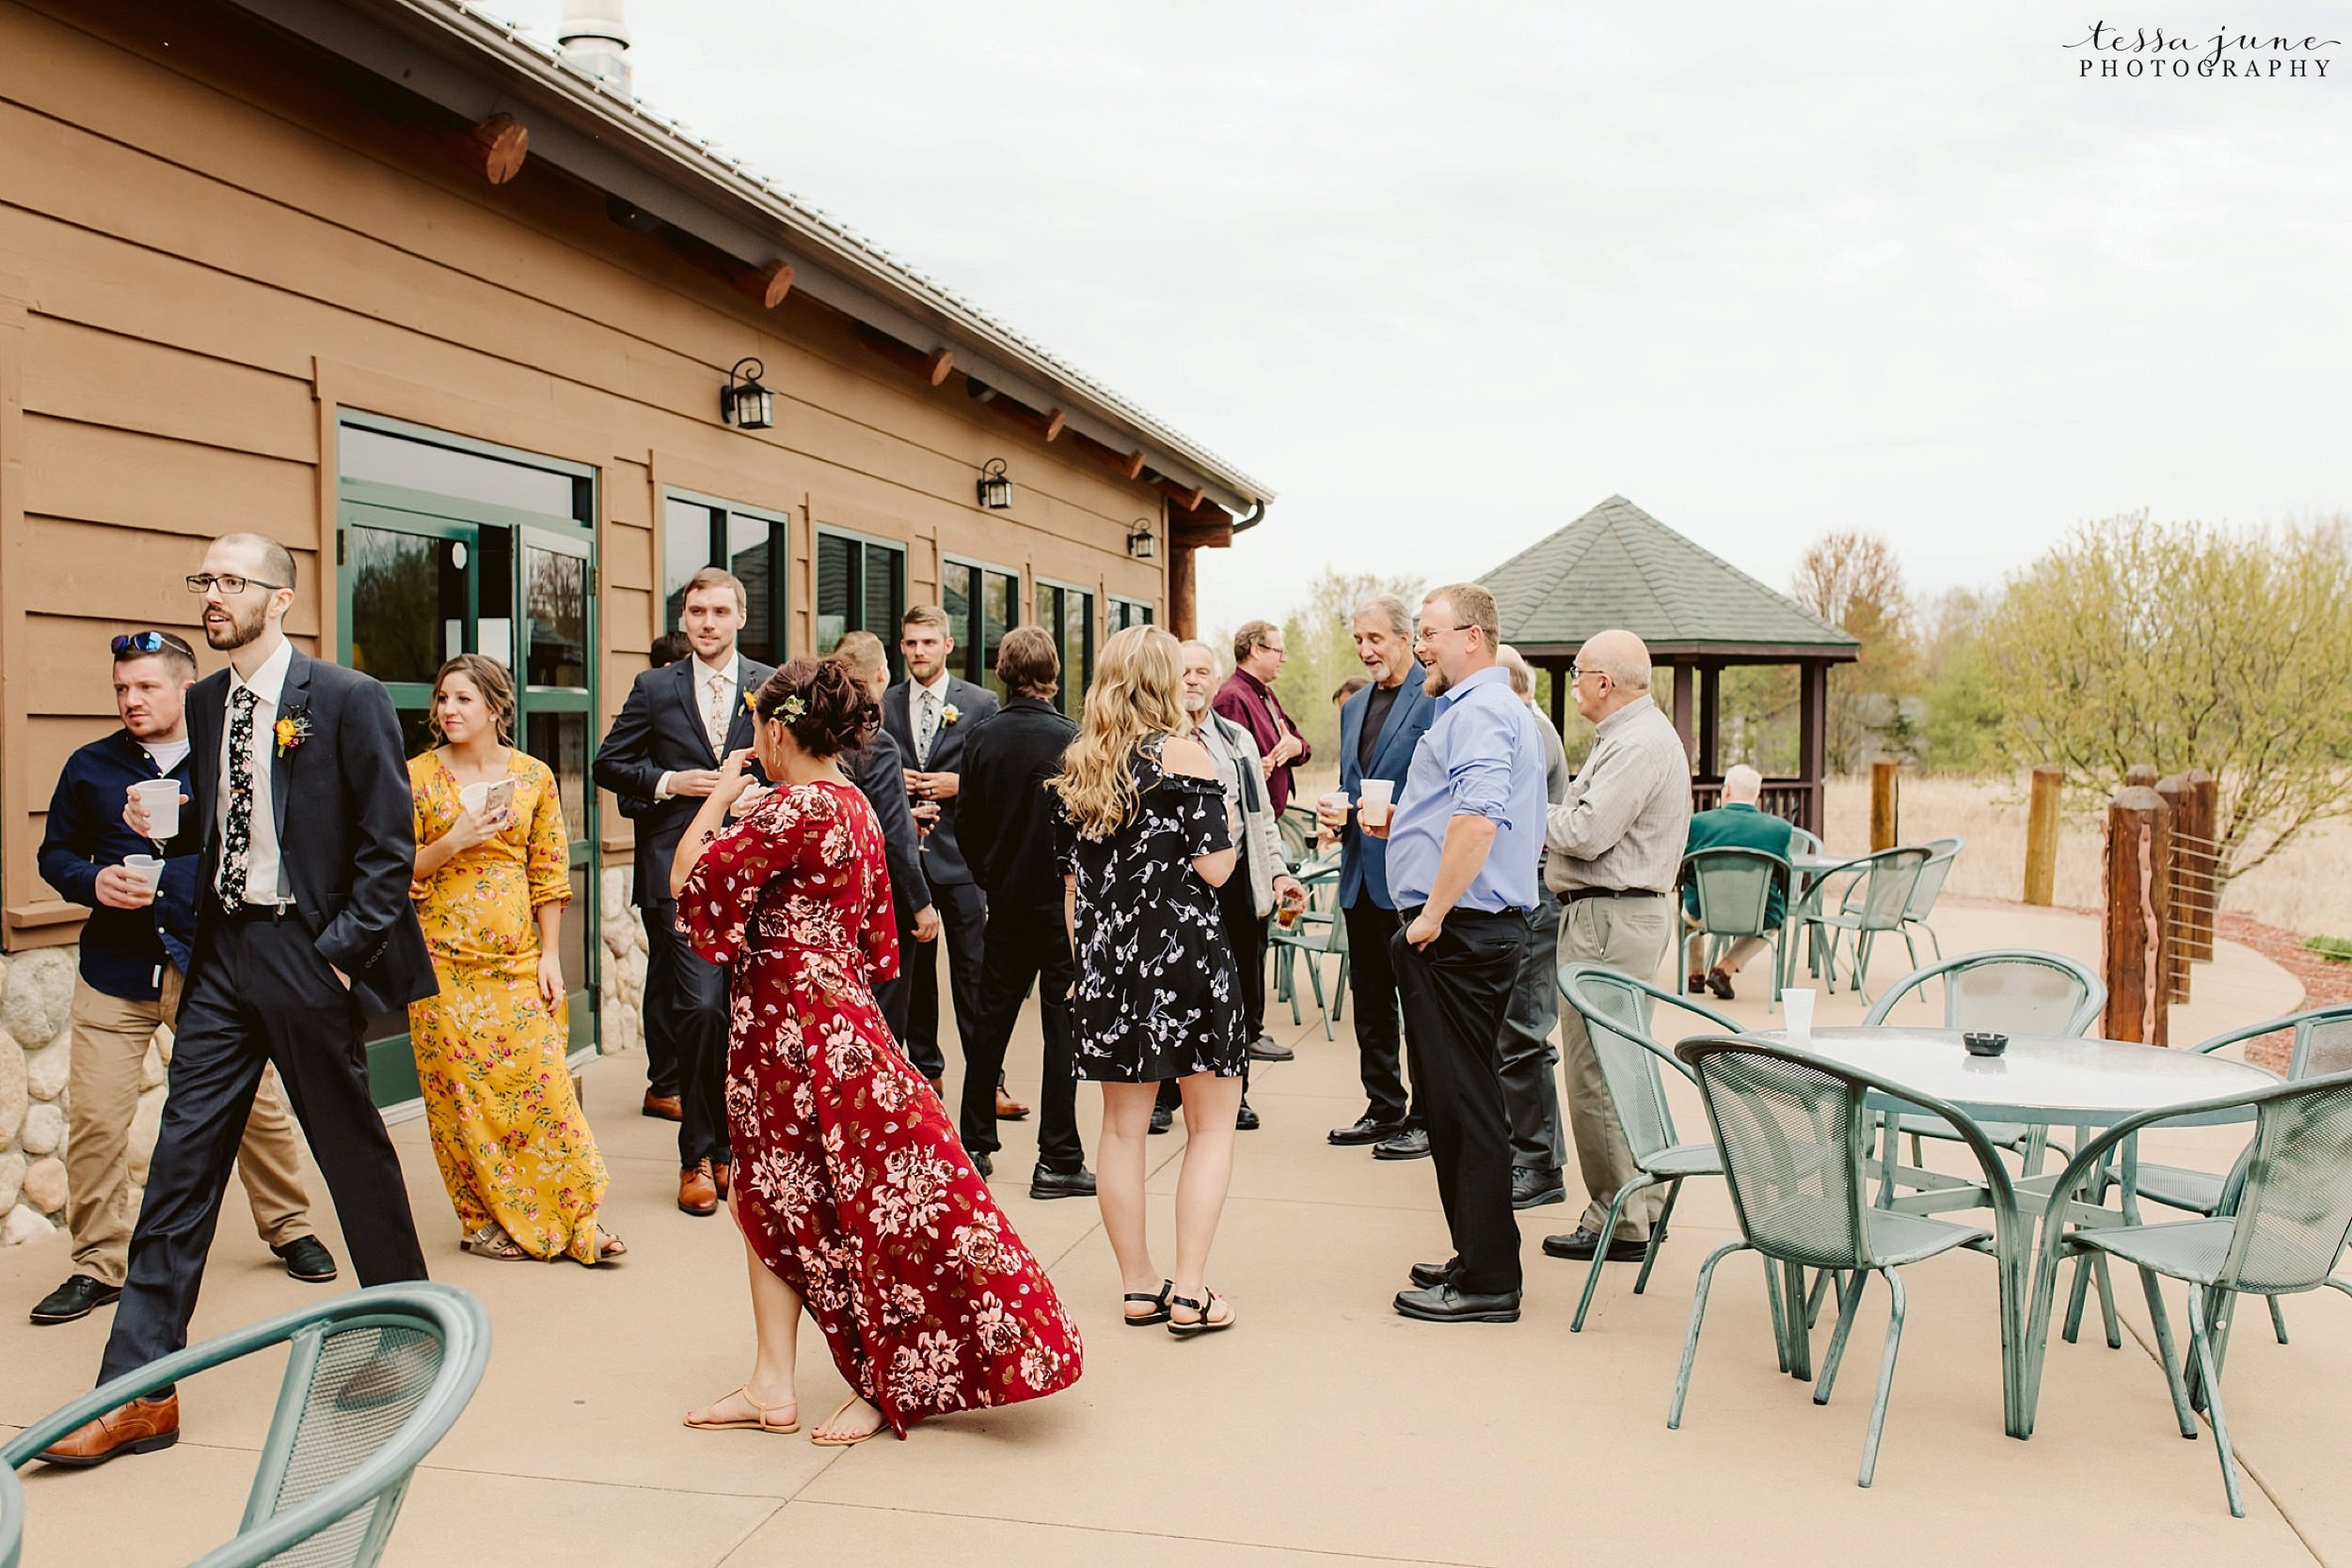 The-grands-at-mulligans-wedding-sartell-minnesota-spring-floral-spring-garden-wedding-119.jpg